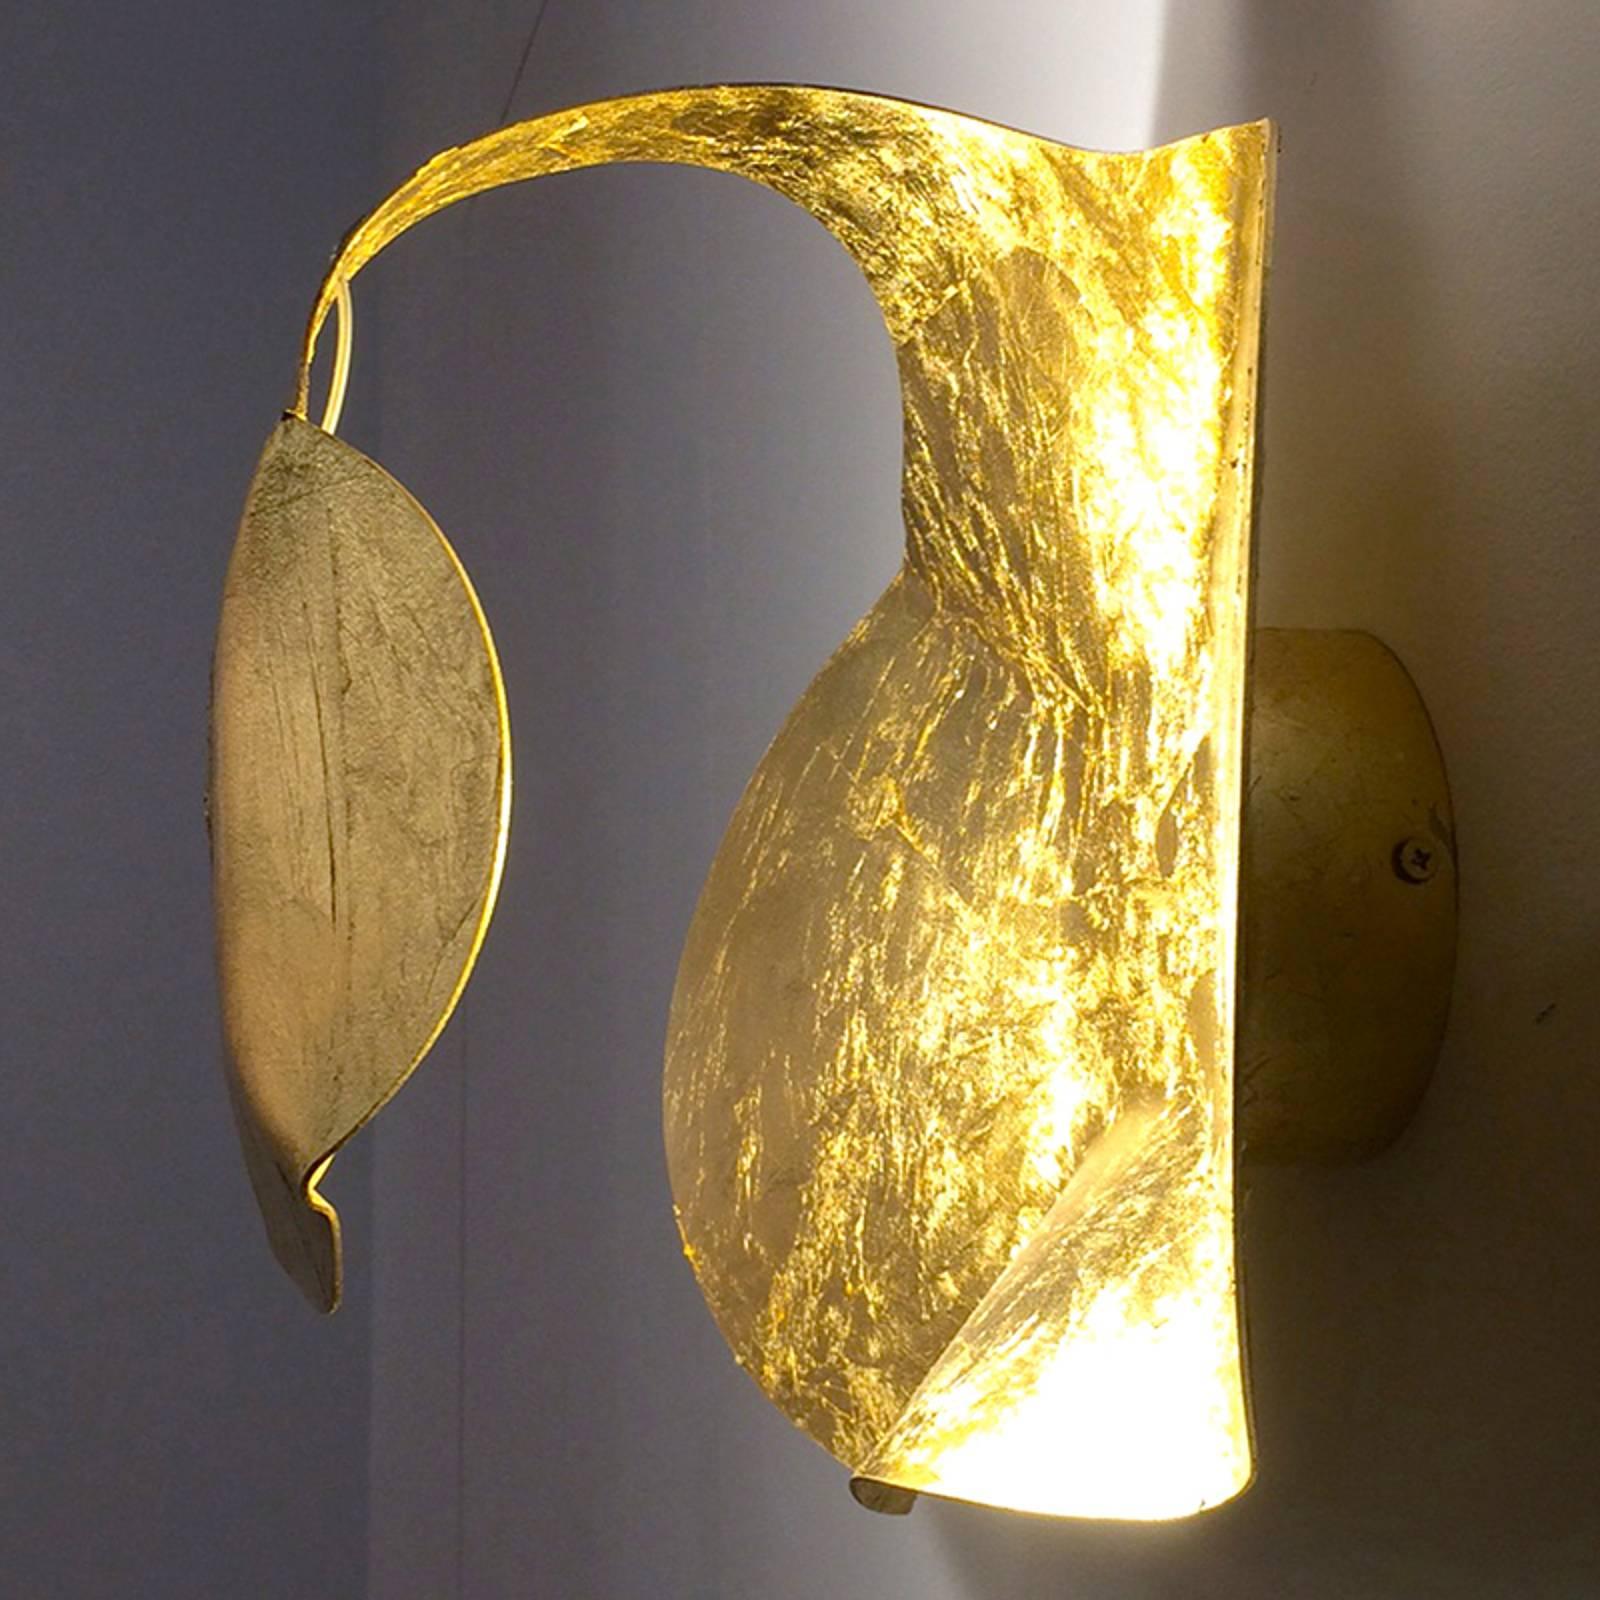 Led designer wandlamp Gi.Gi, 40 cm, goud